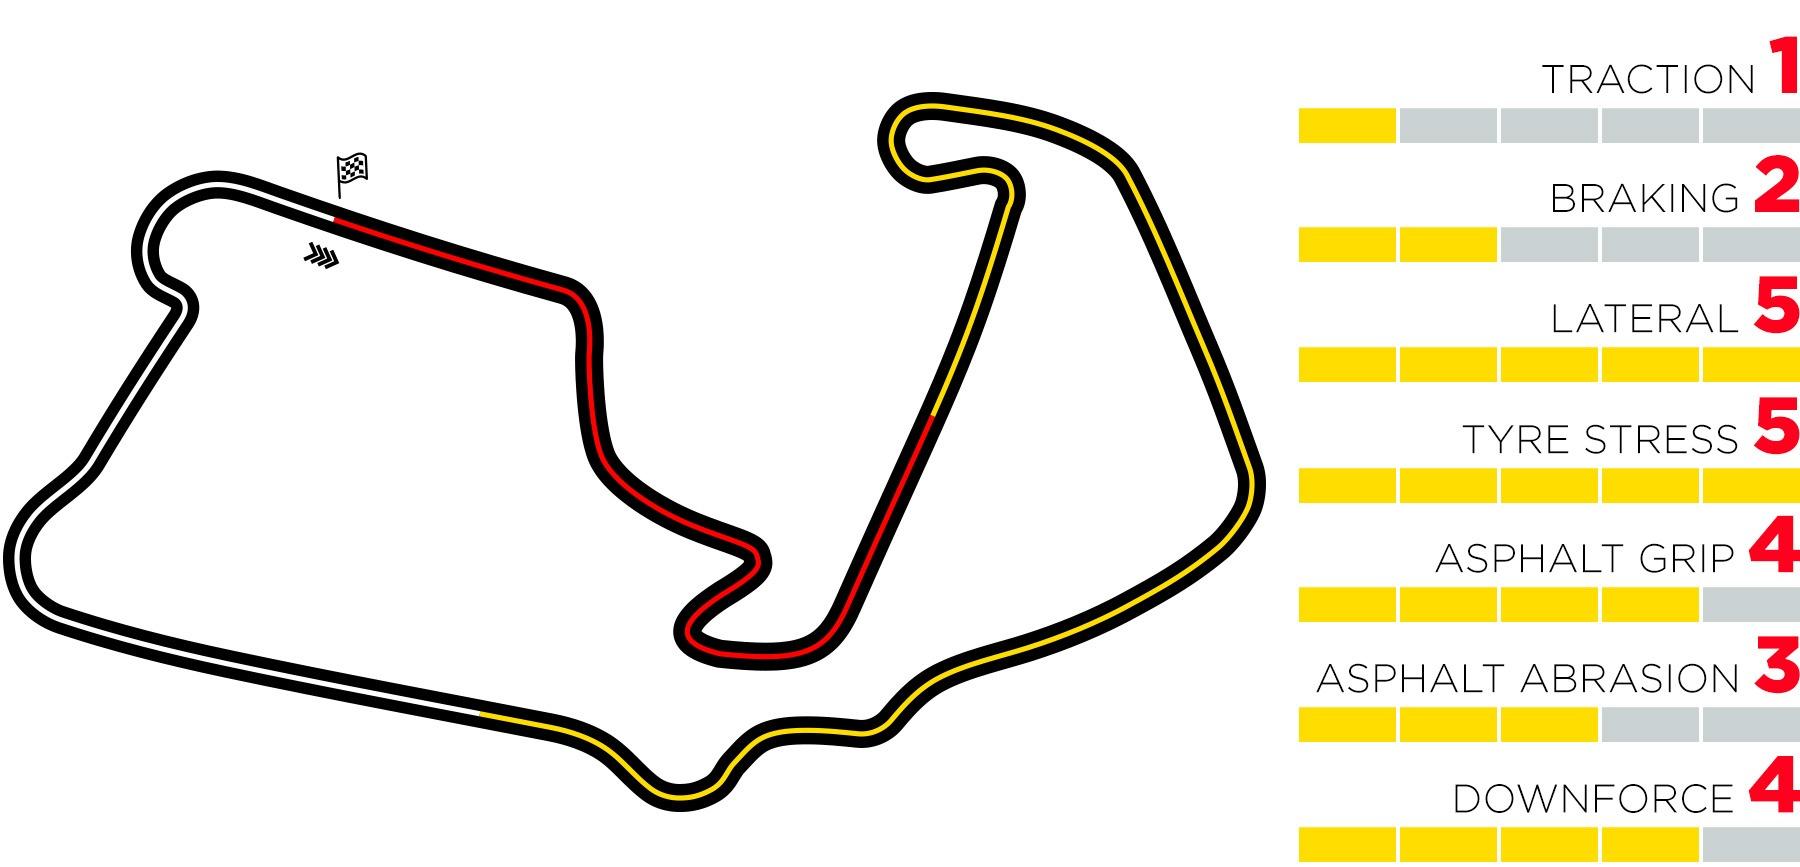 2020 British Grand Prix - Tyres